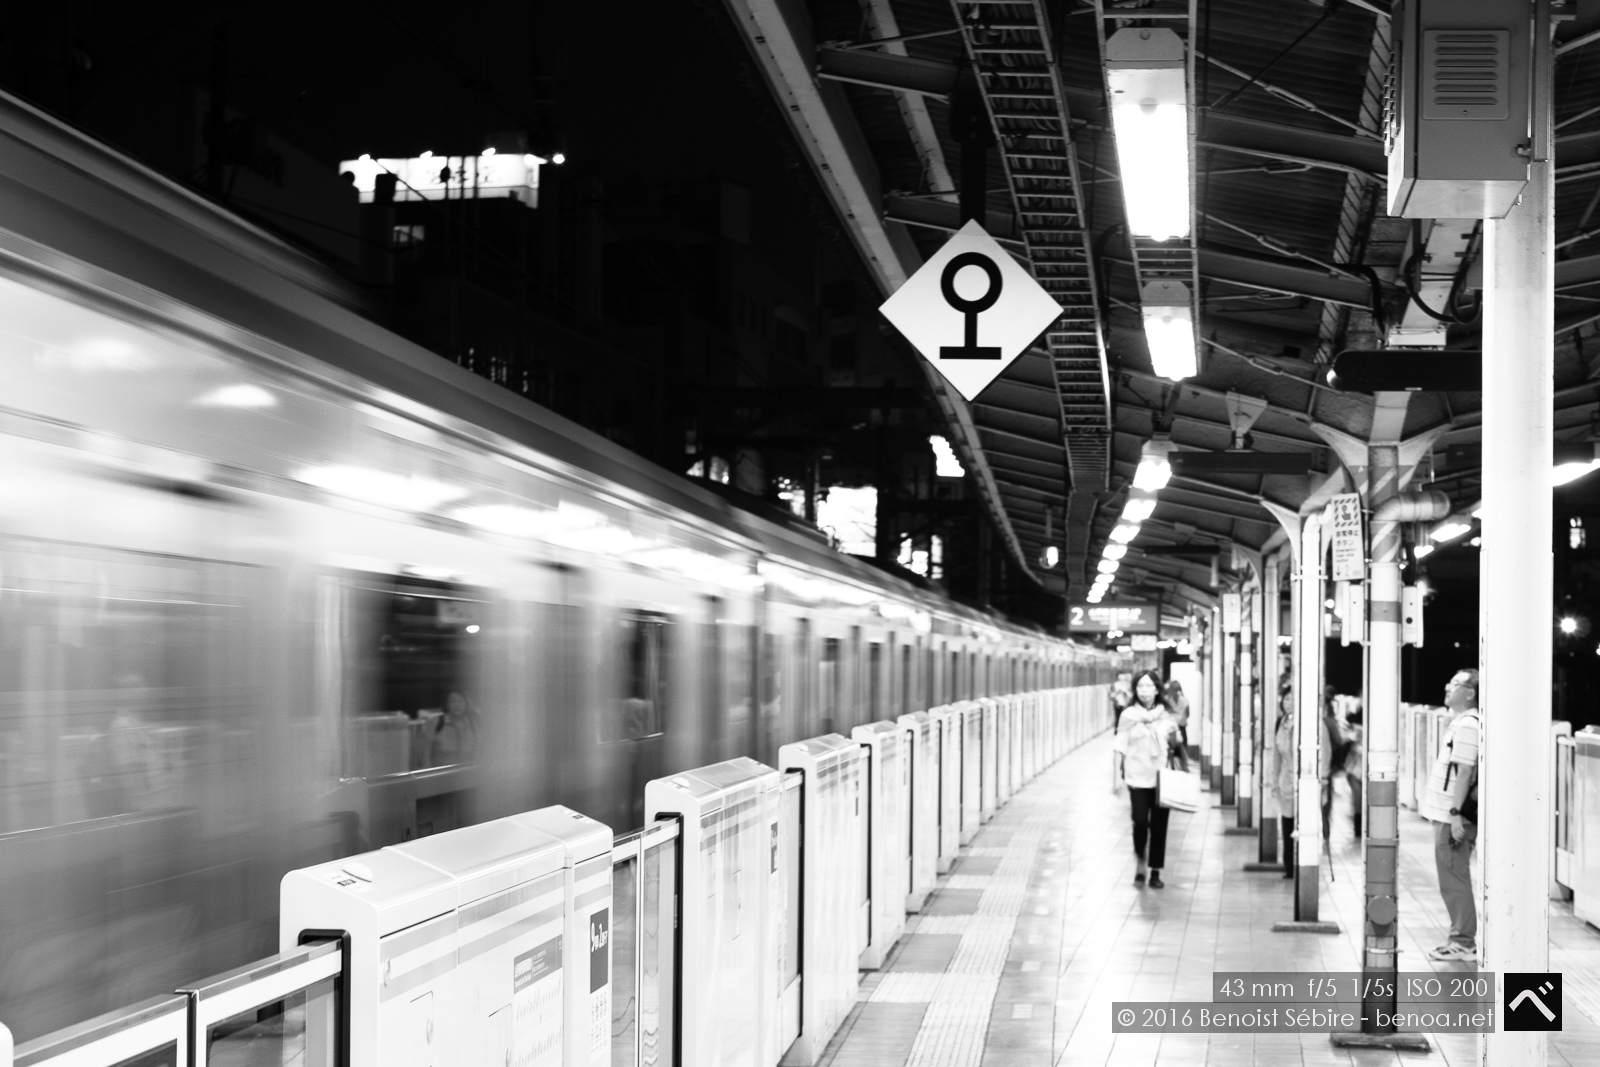 JR Platform